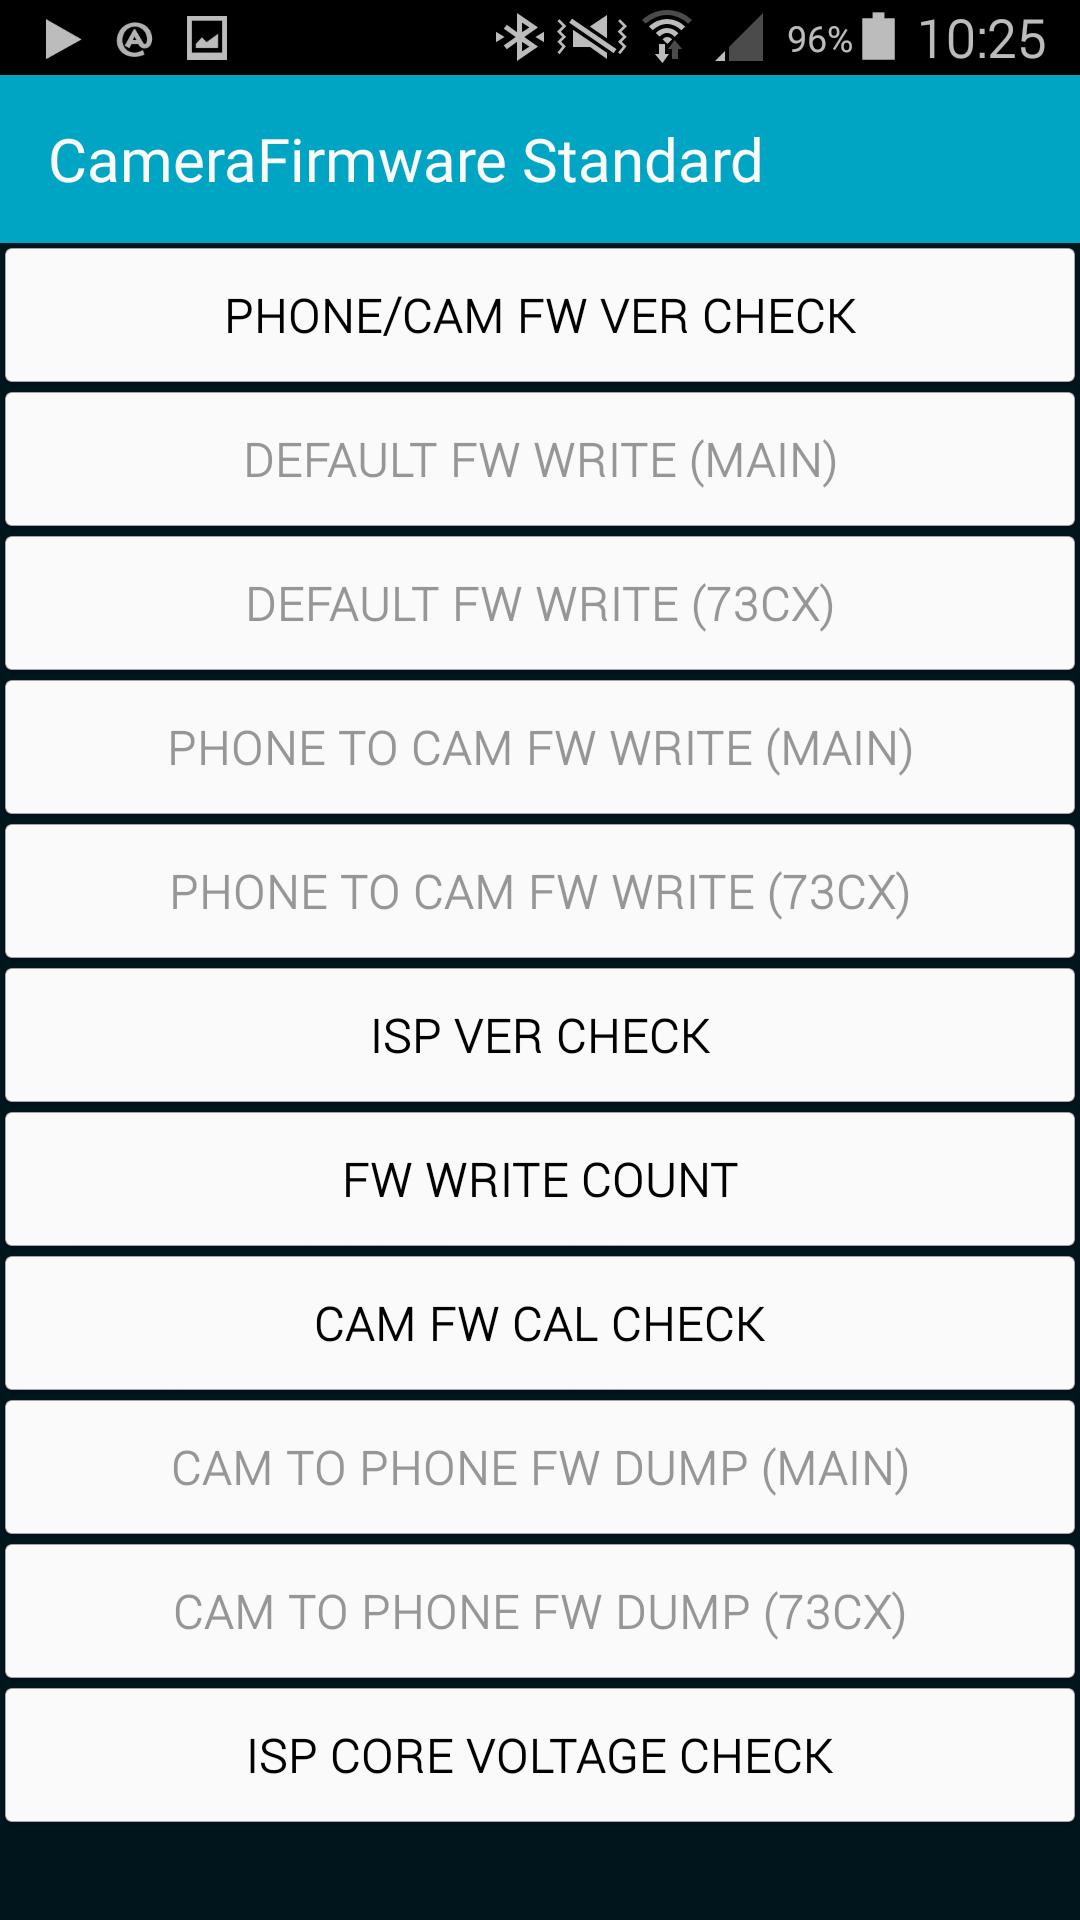 Berühmt Samsung [Secret Code][Geheime Codes][USSD Codes] - Samsung DO97